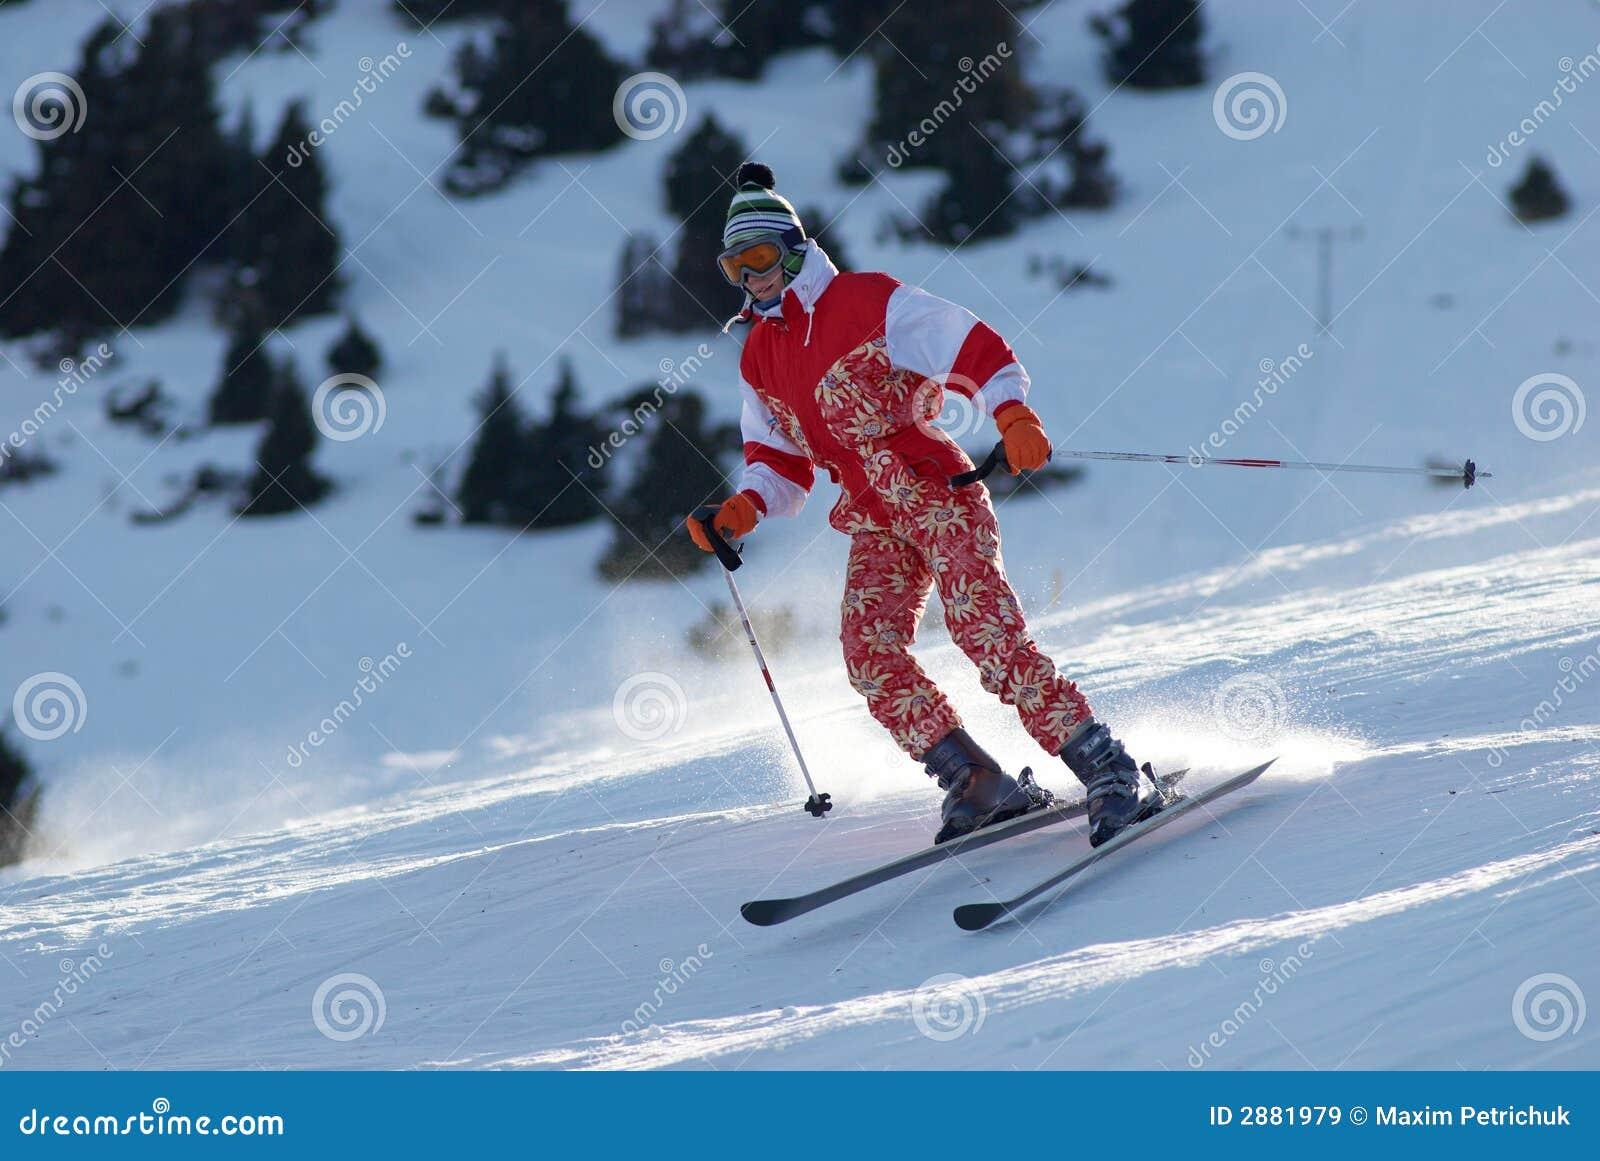 La fille de ski allument la pente